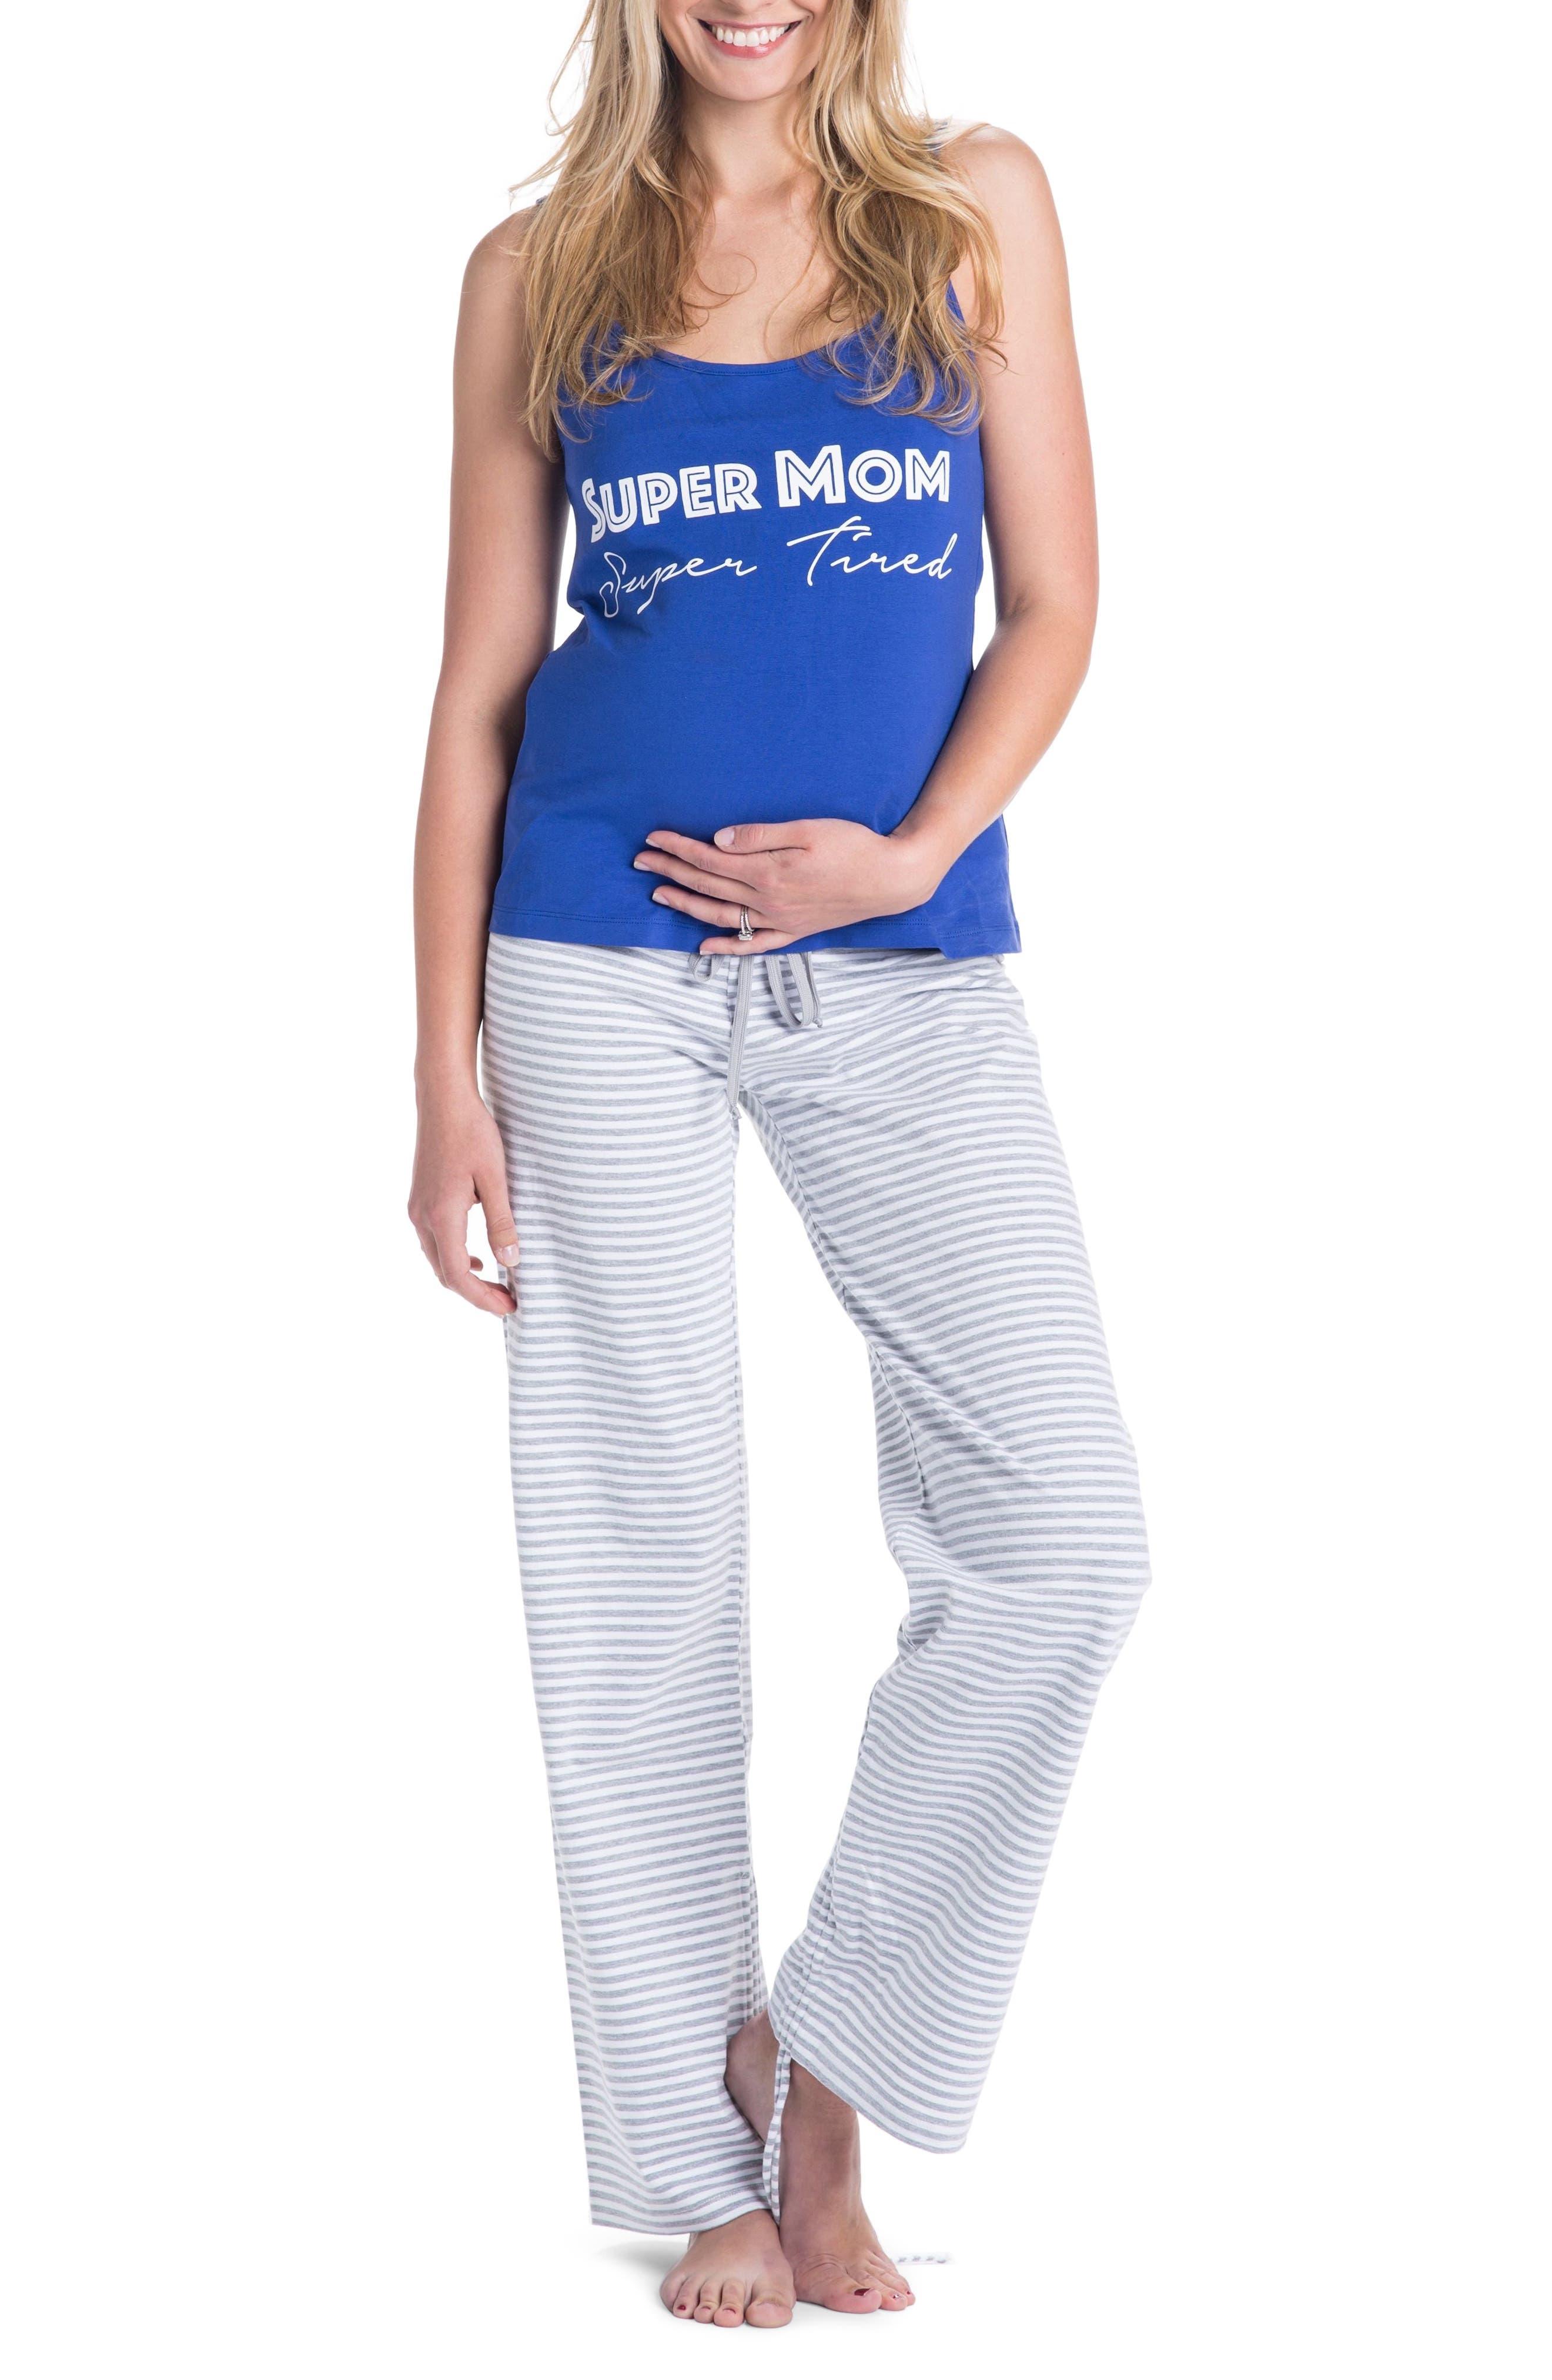 Trudy Super Mom Maternity/Nursing Pajamas,                         Main,                         color, NAVY BLUE/ GRAY/ WHITE STRIPES